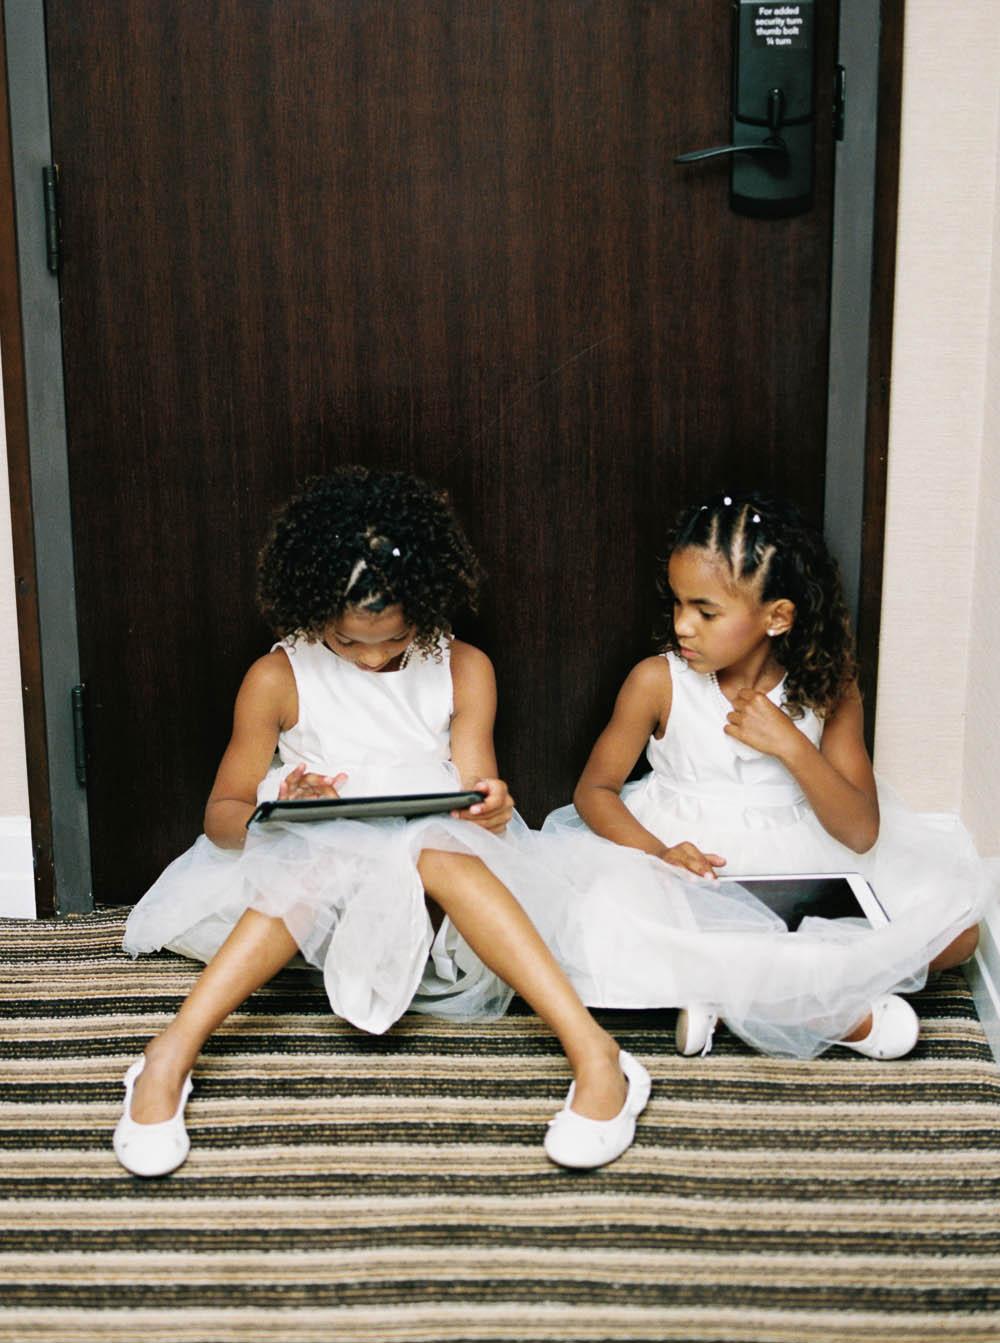 nashville ruby film documentary wedding photographer heartfelt real moments african american wedding munalachi bride ©2016abigailbobophotography-7.jpg